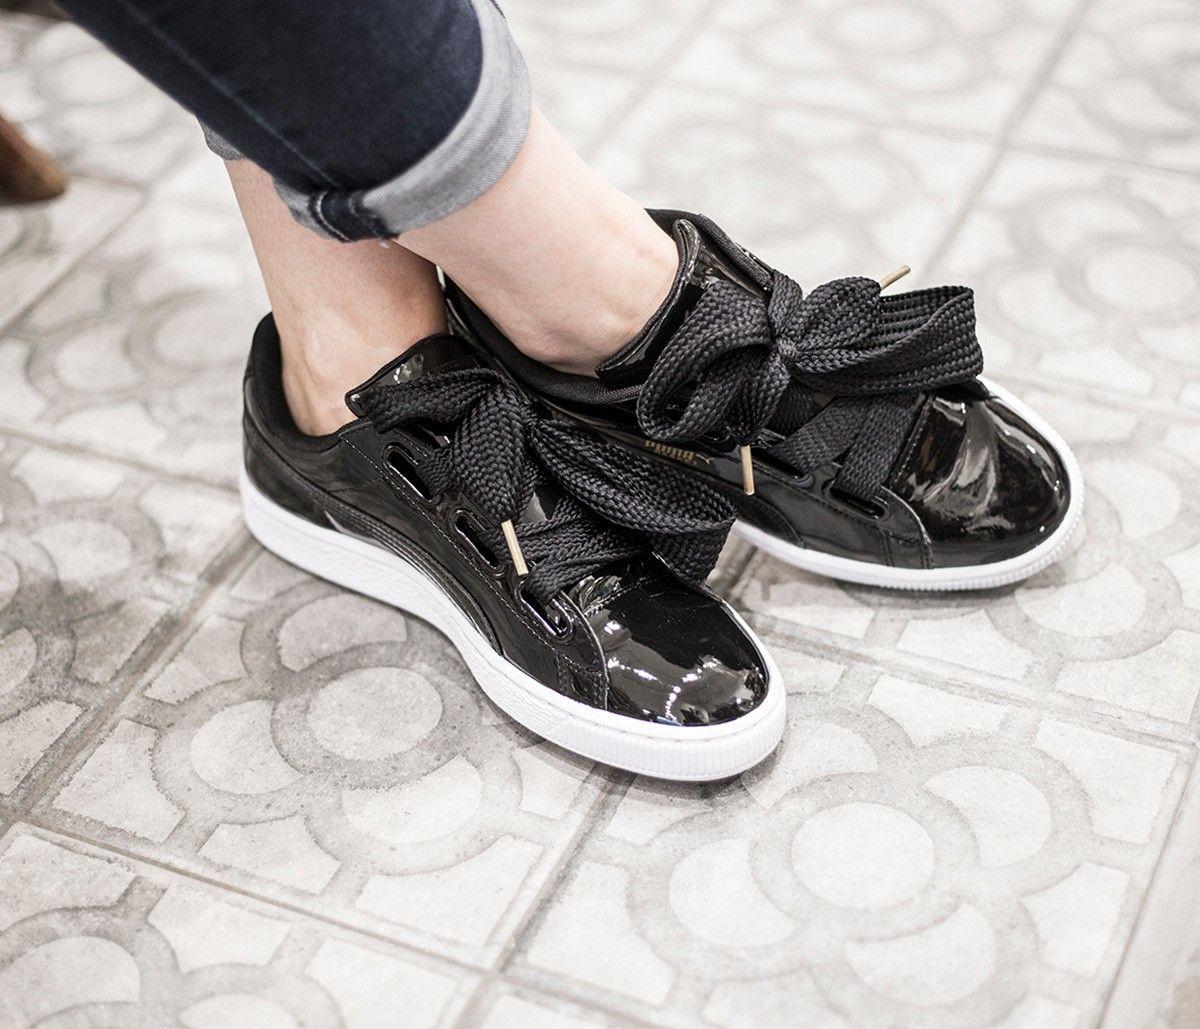 puma 363073 basket heart patent black idenza aw16 17 puma idenza new shoes black sneaker. Black Bedroom Furniture Sets. Home Design Ideas